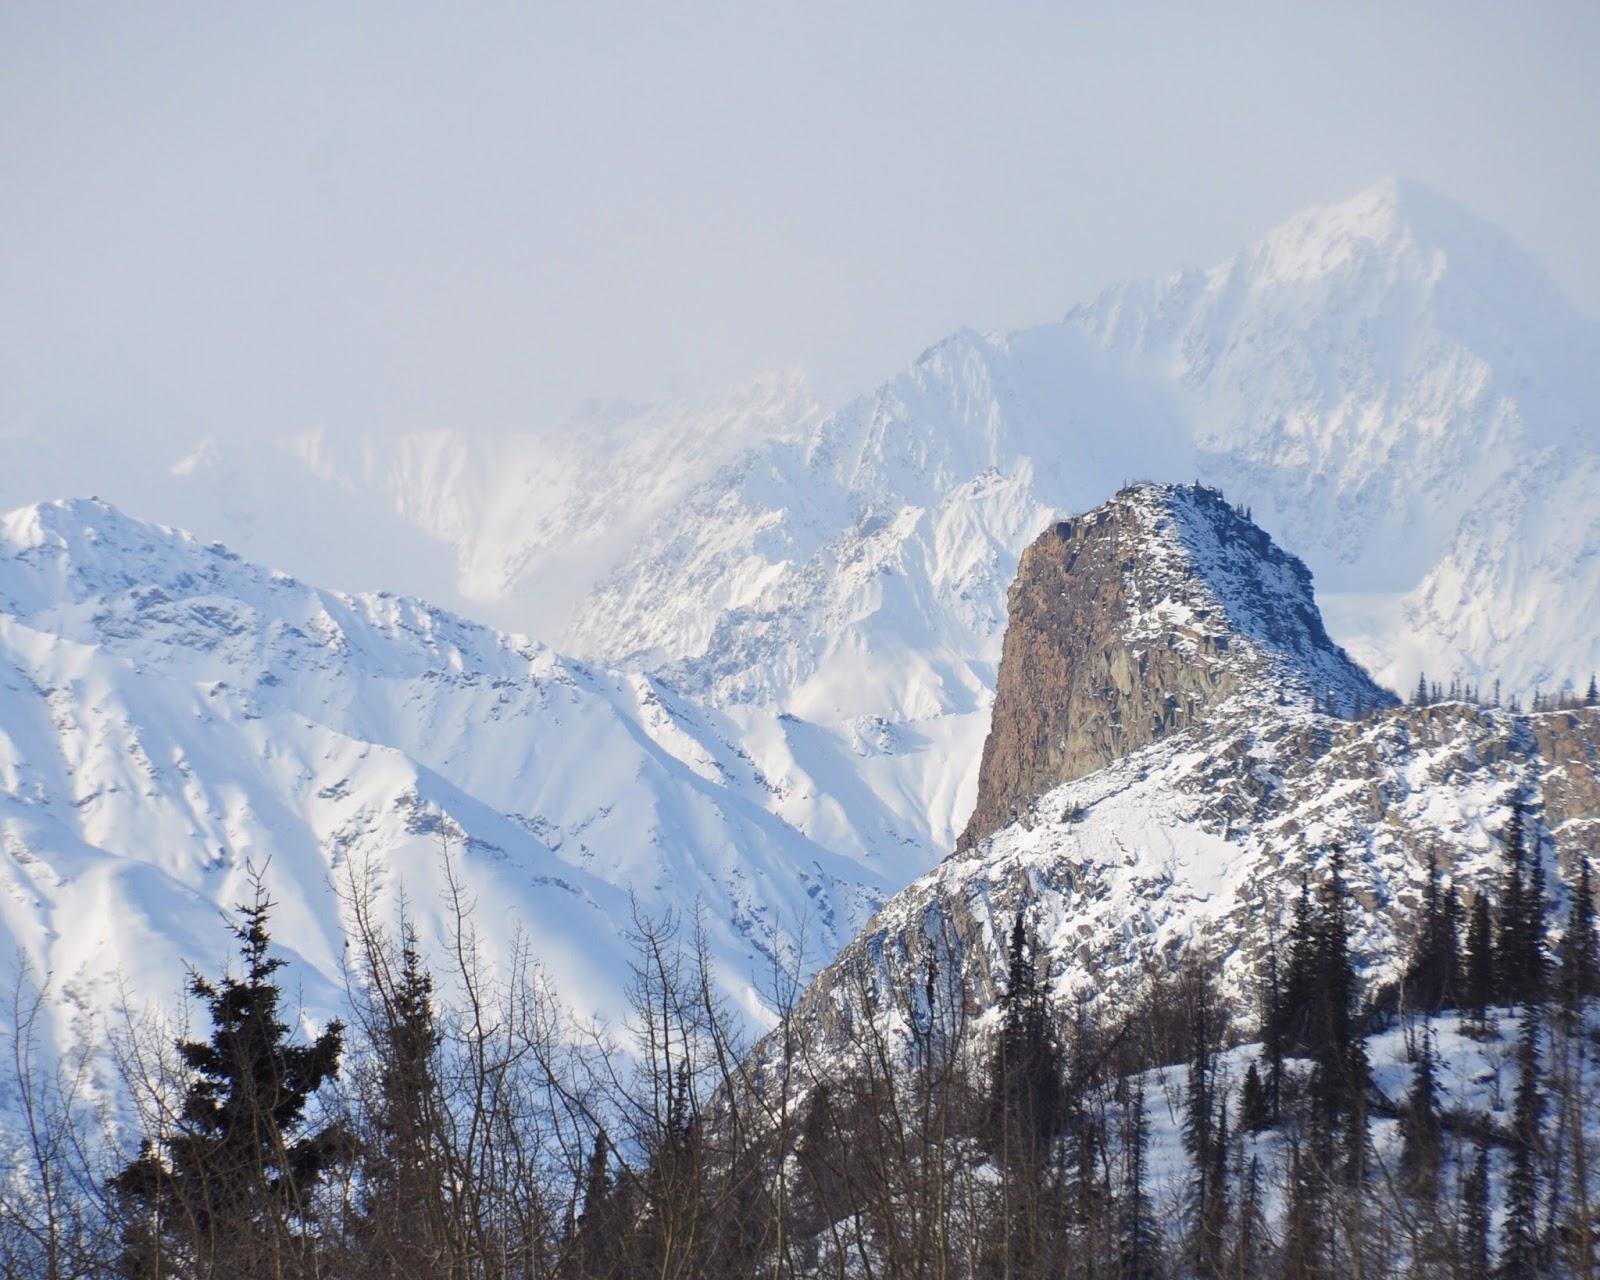 landscapes mountains snow winter